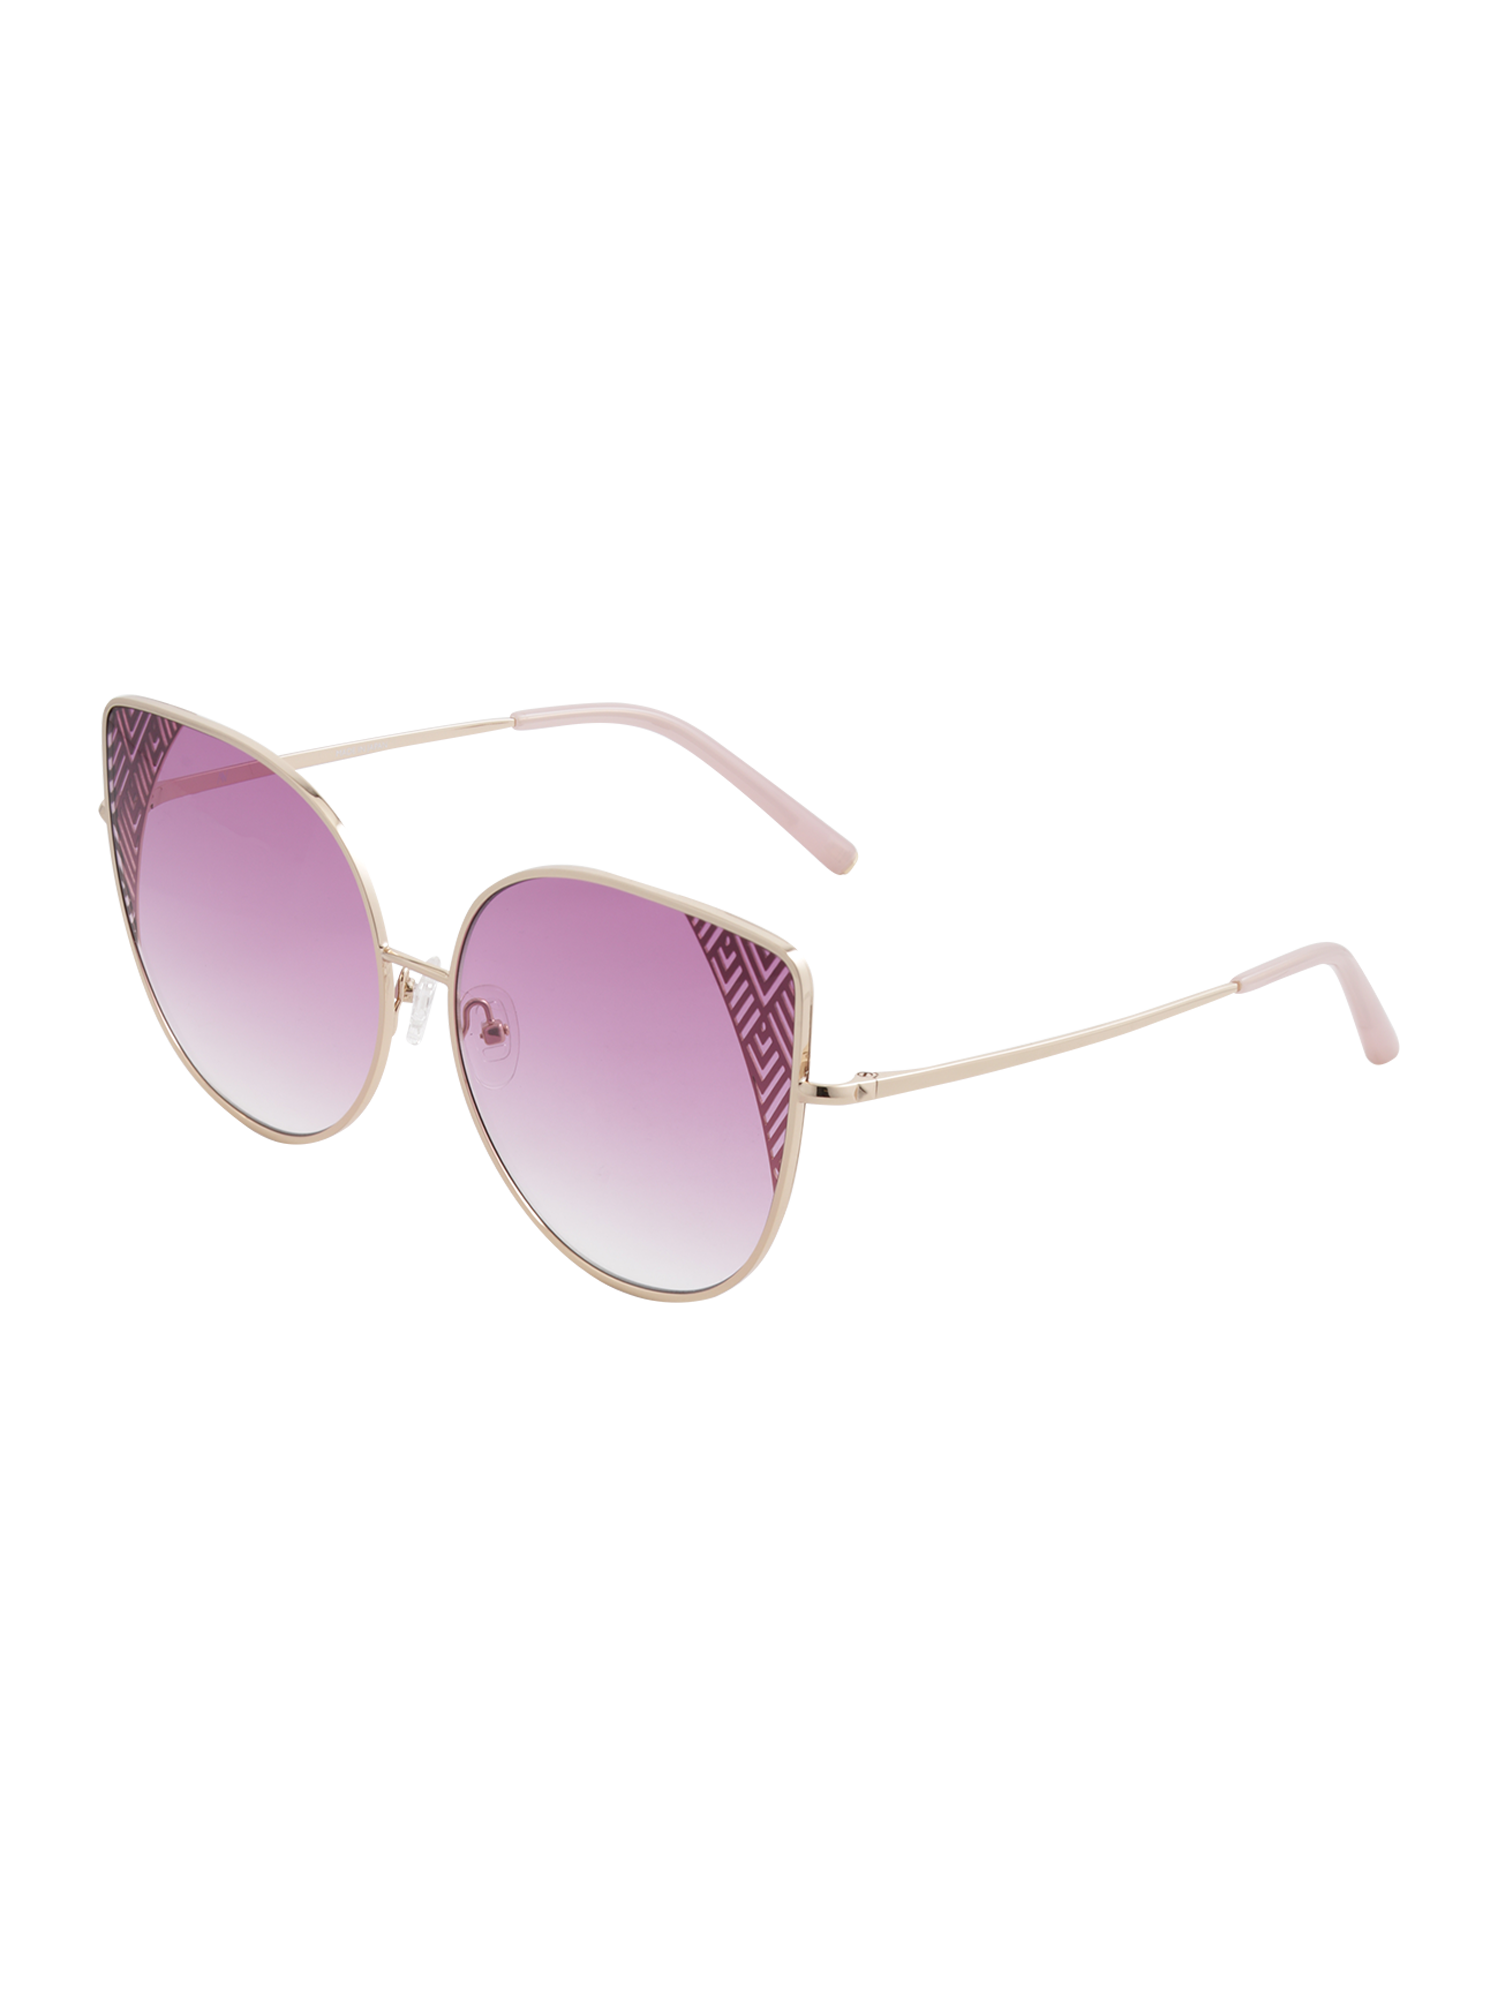 Slnečné okuliare 'ORCHID LIGHT'